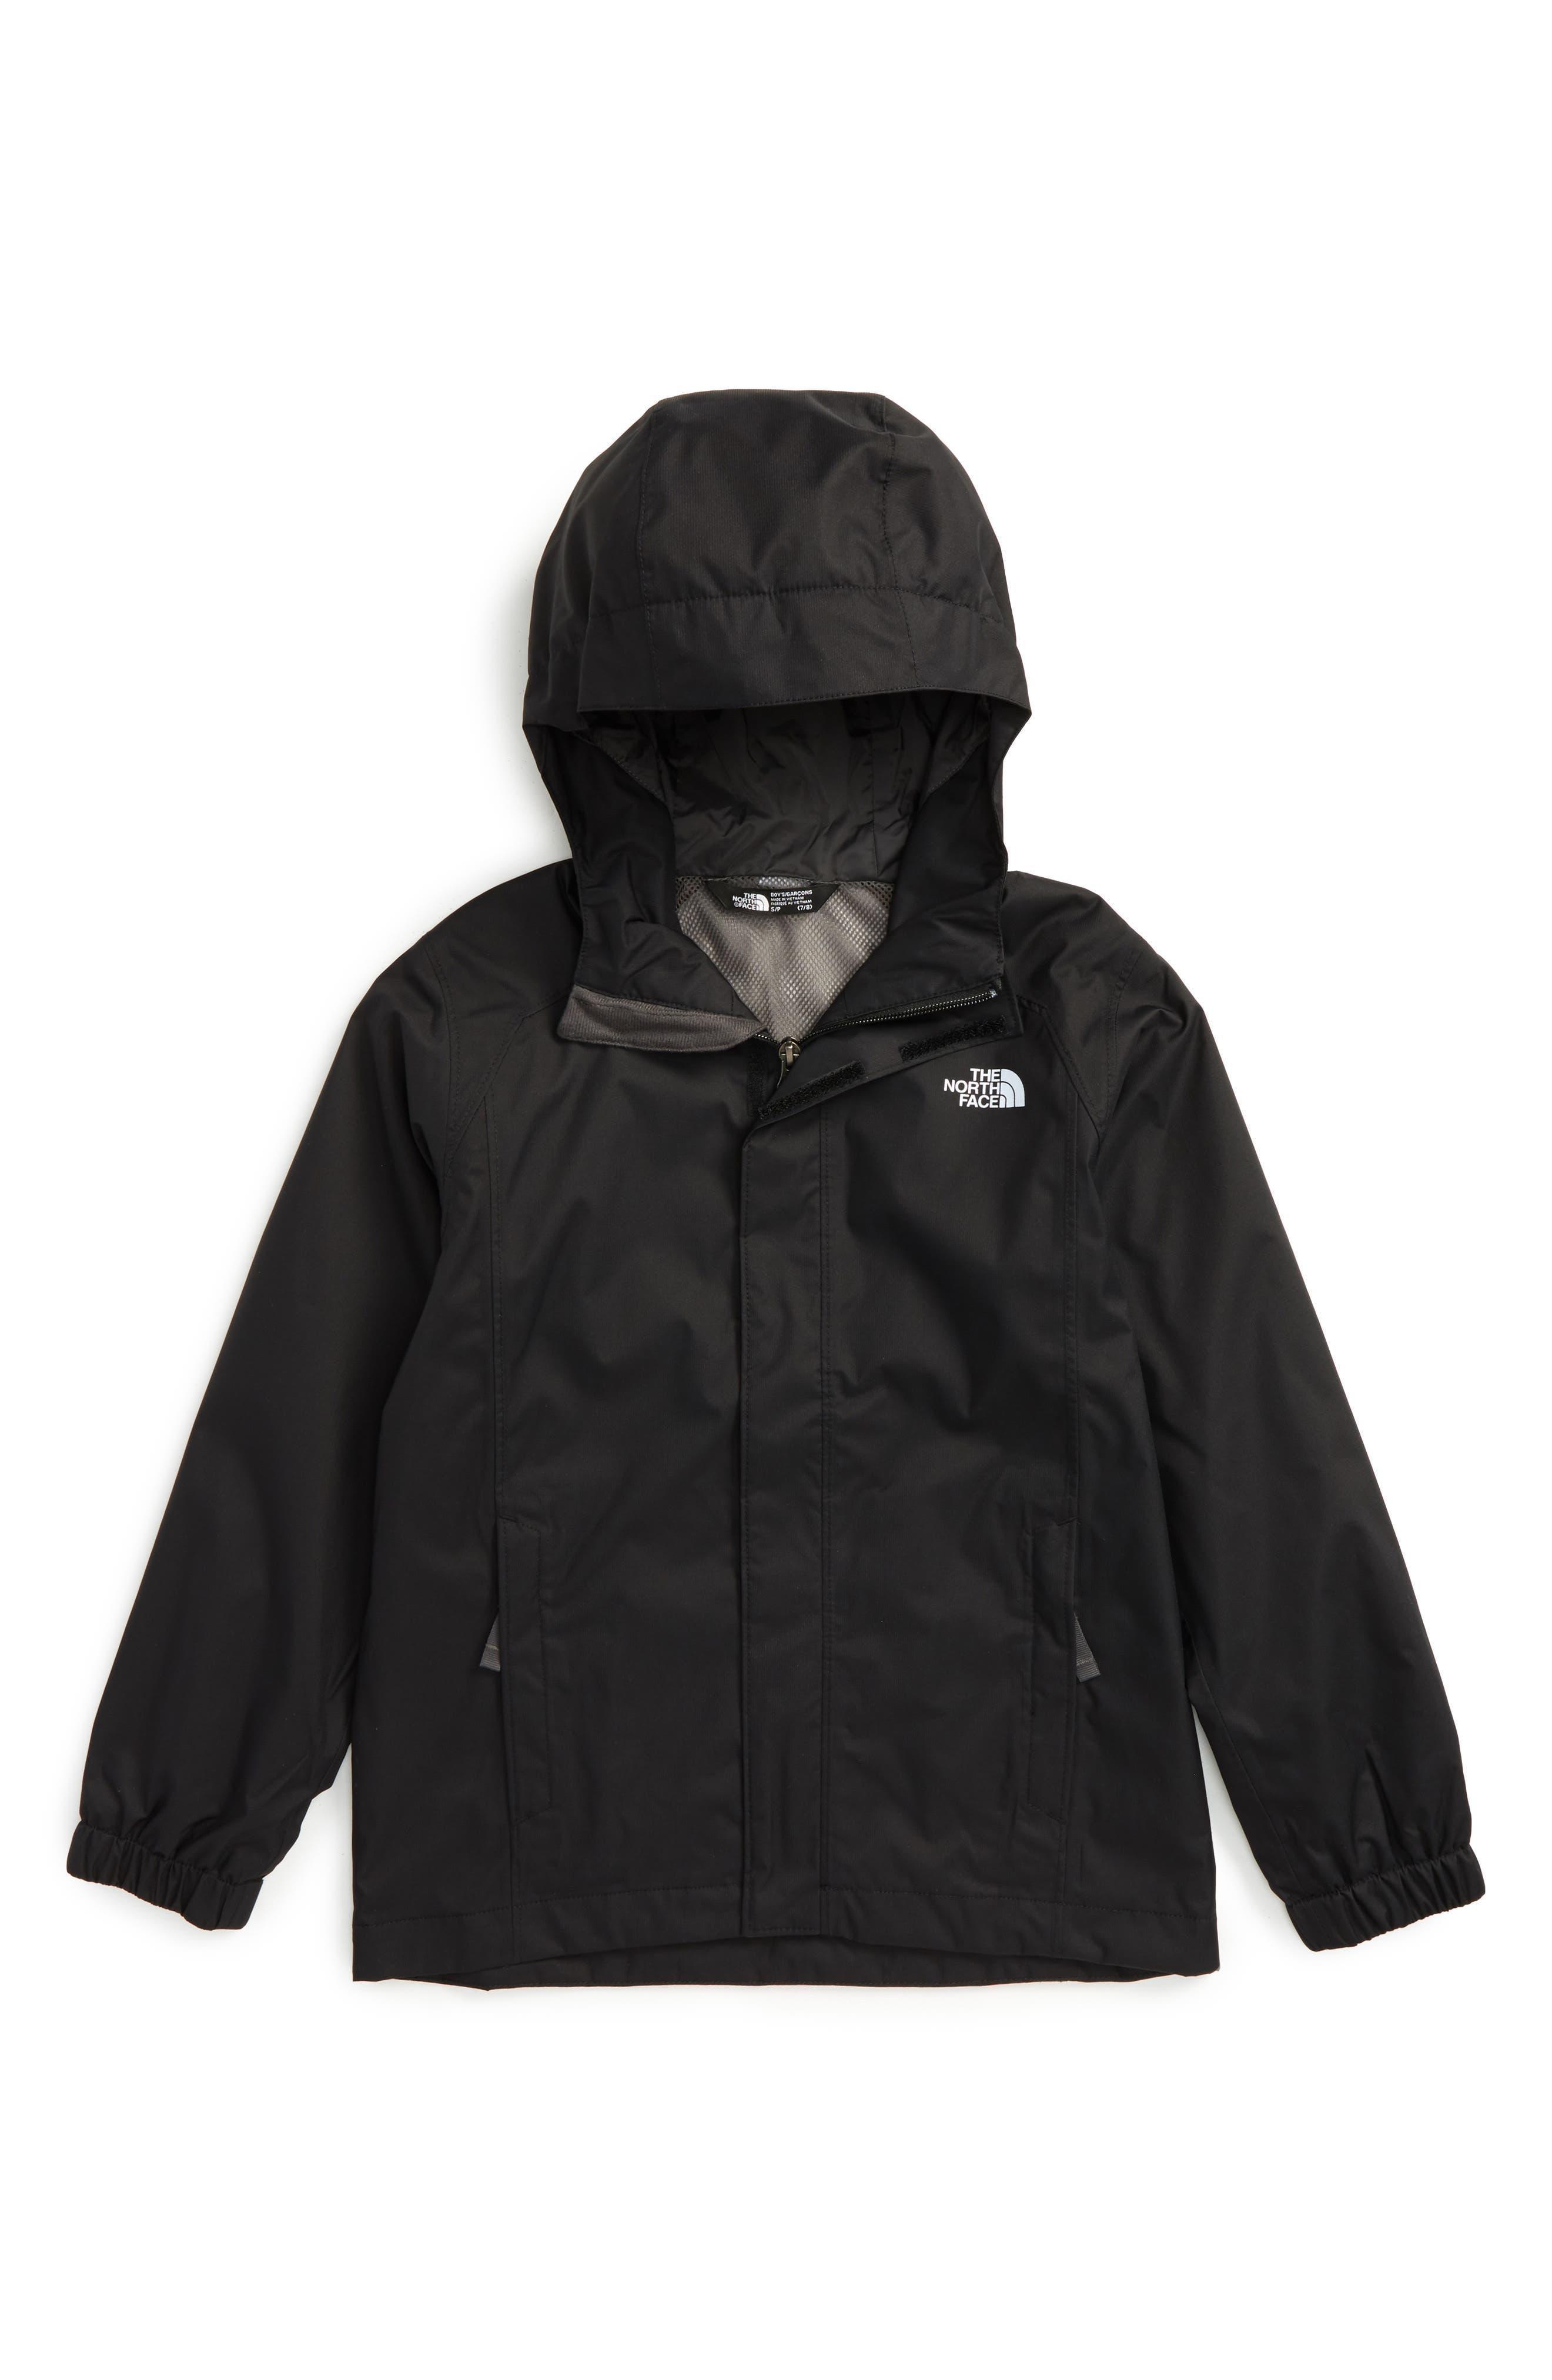 'Resolve' Waterproof Jacket,                         Main,                         color, 5 Tnf Black